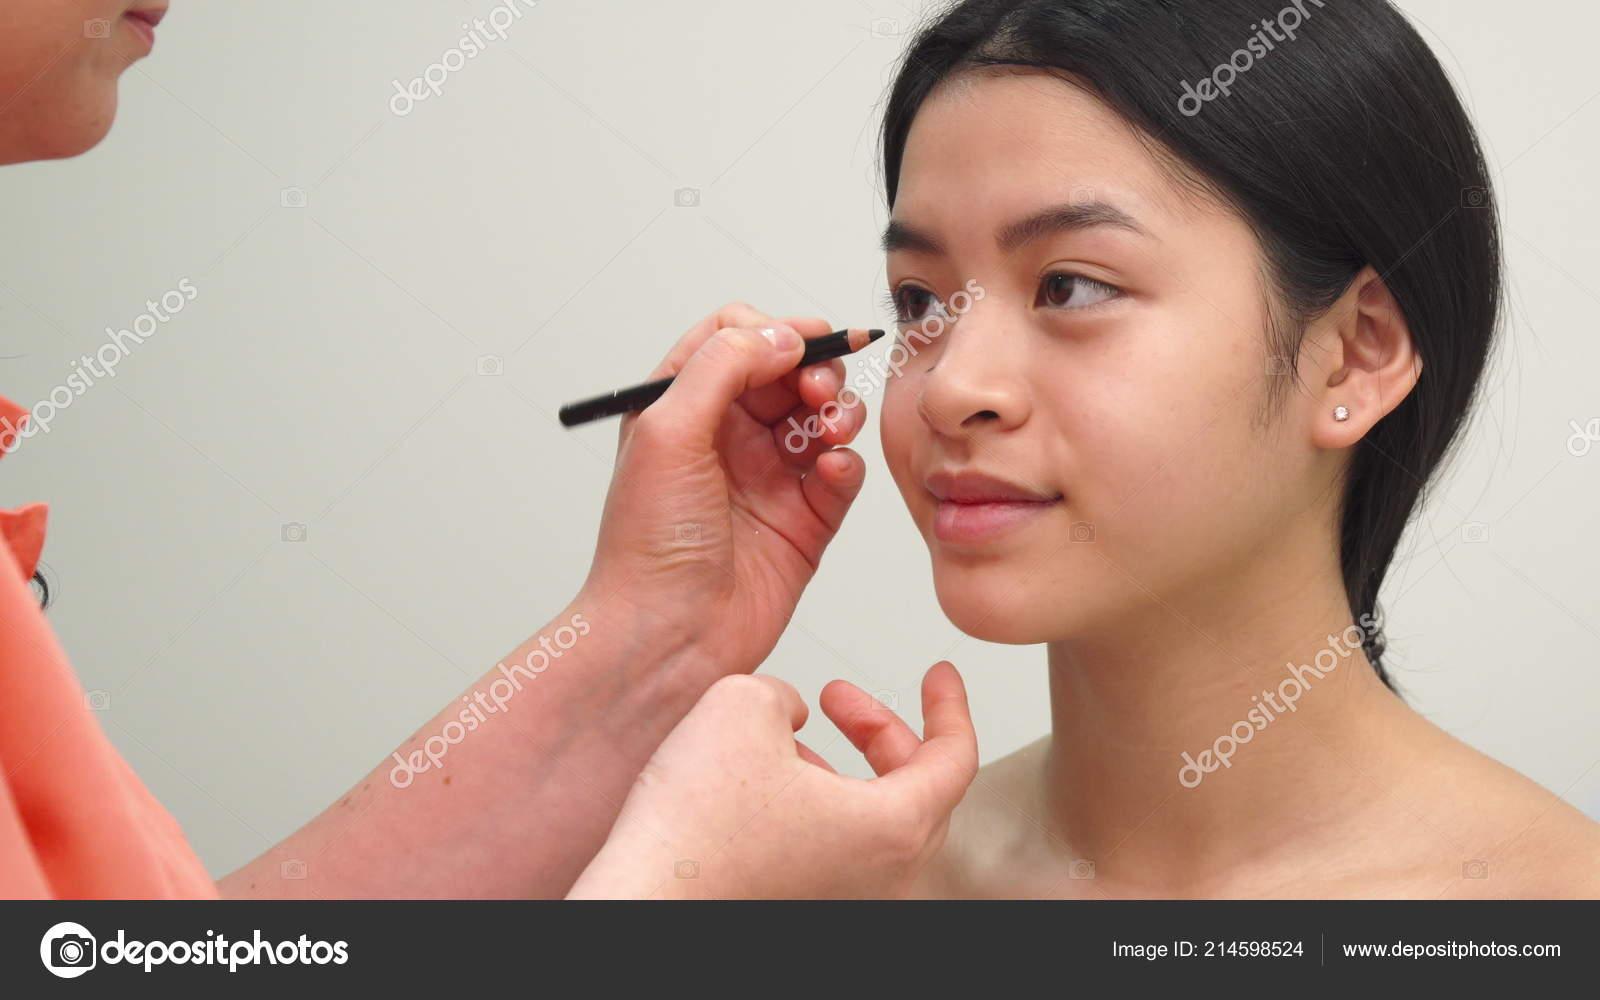 Especialista Em Beleza Usa Lapis Cosmetico Stock Photo C Kotlyarn 214598524